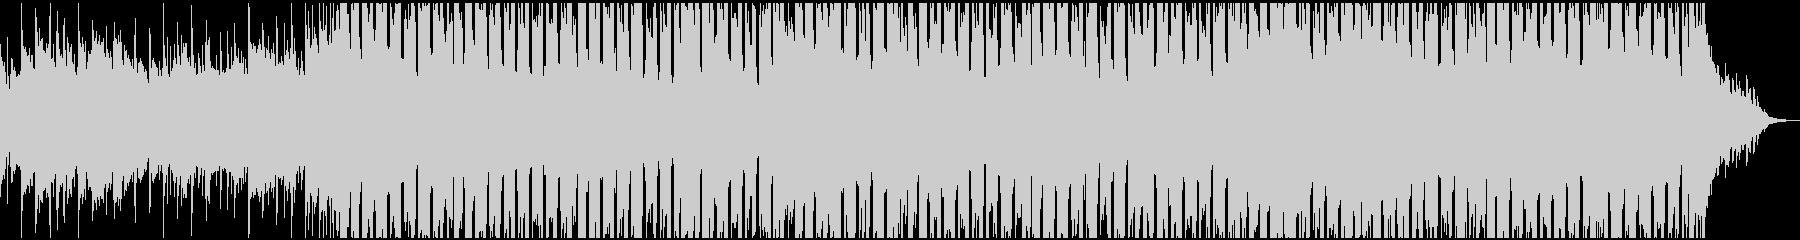 This soundtrack w...'s unreproduced waveform